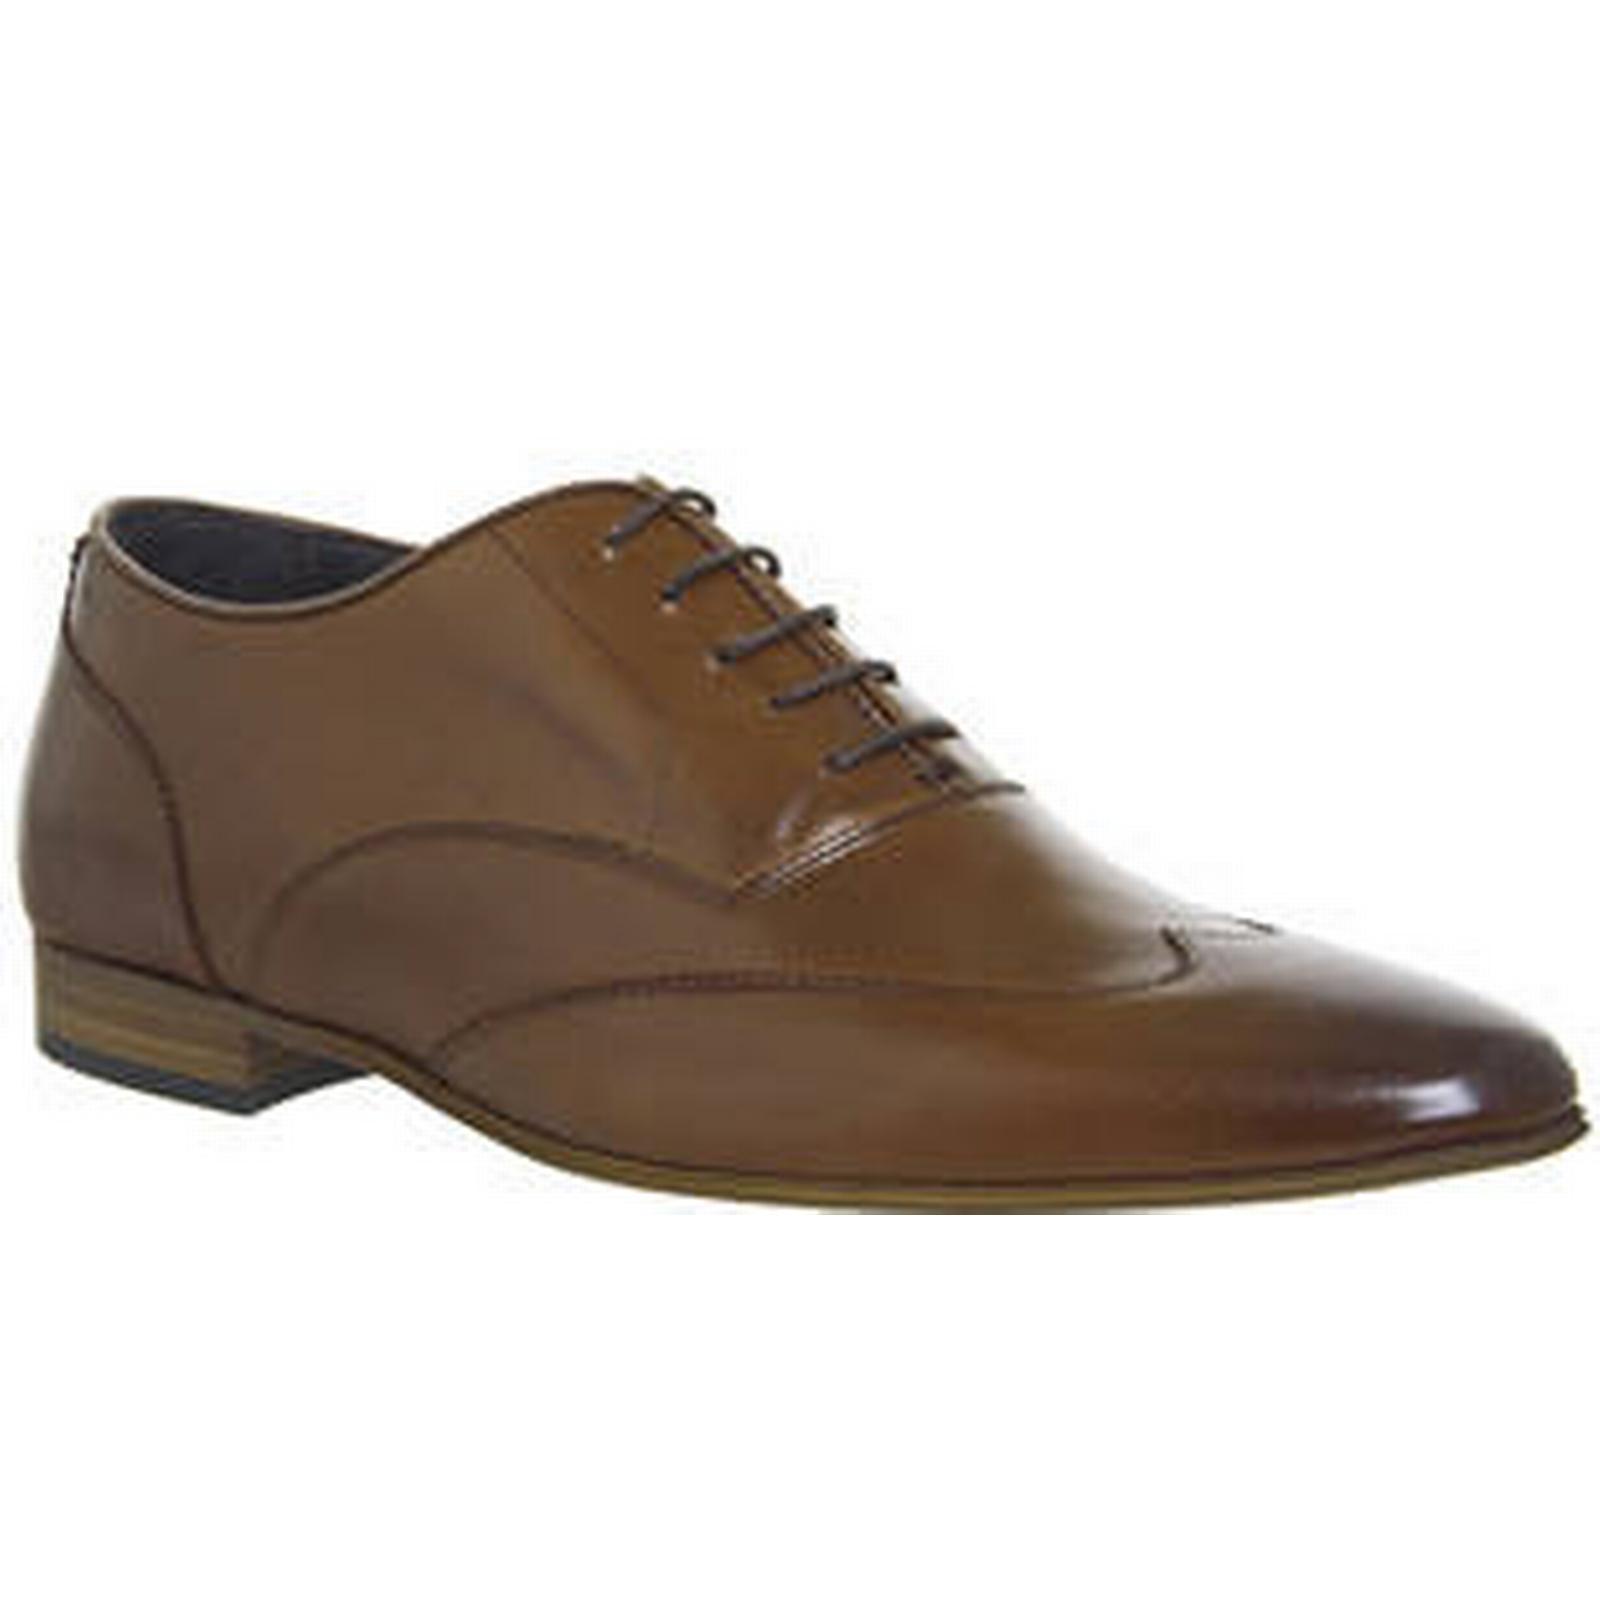 pretty nice d400f 0427c Ask the Missus Honour Wingtip Oxford TAN TAN TAN LEATHER 0cc5ac. Spartoo.co.uk  Nike SB Check Solar men s Shoes ...